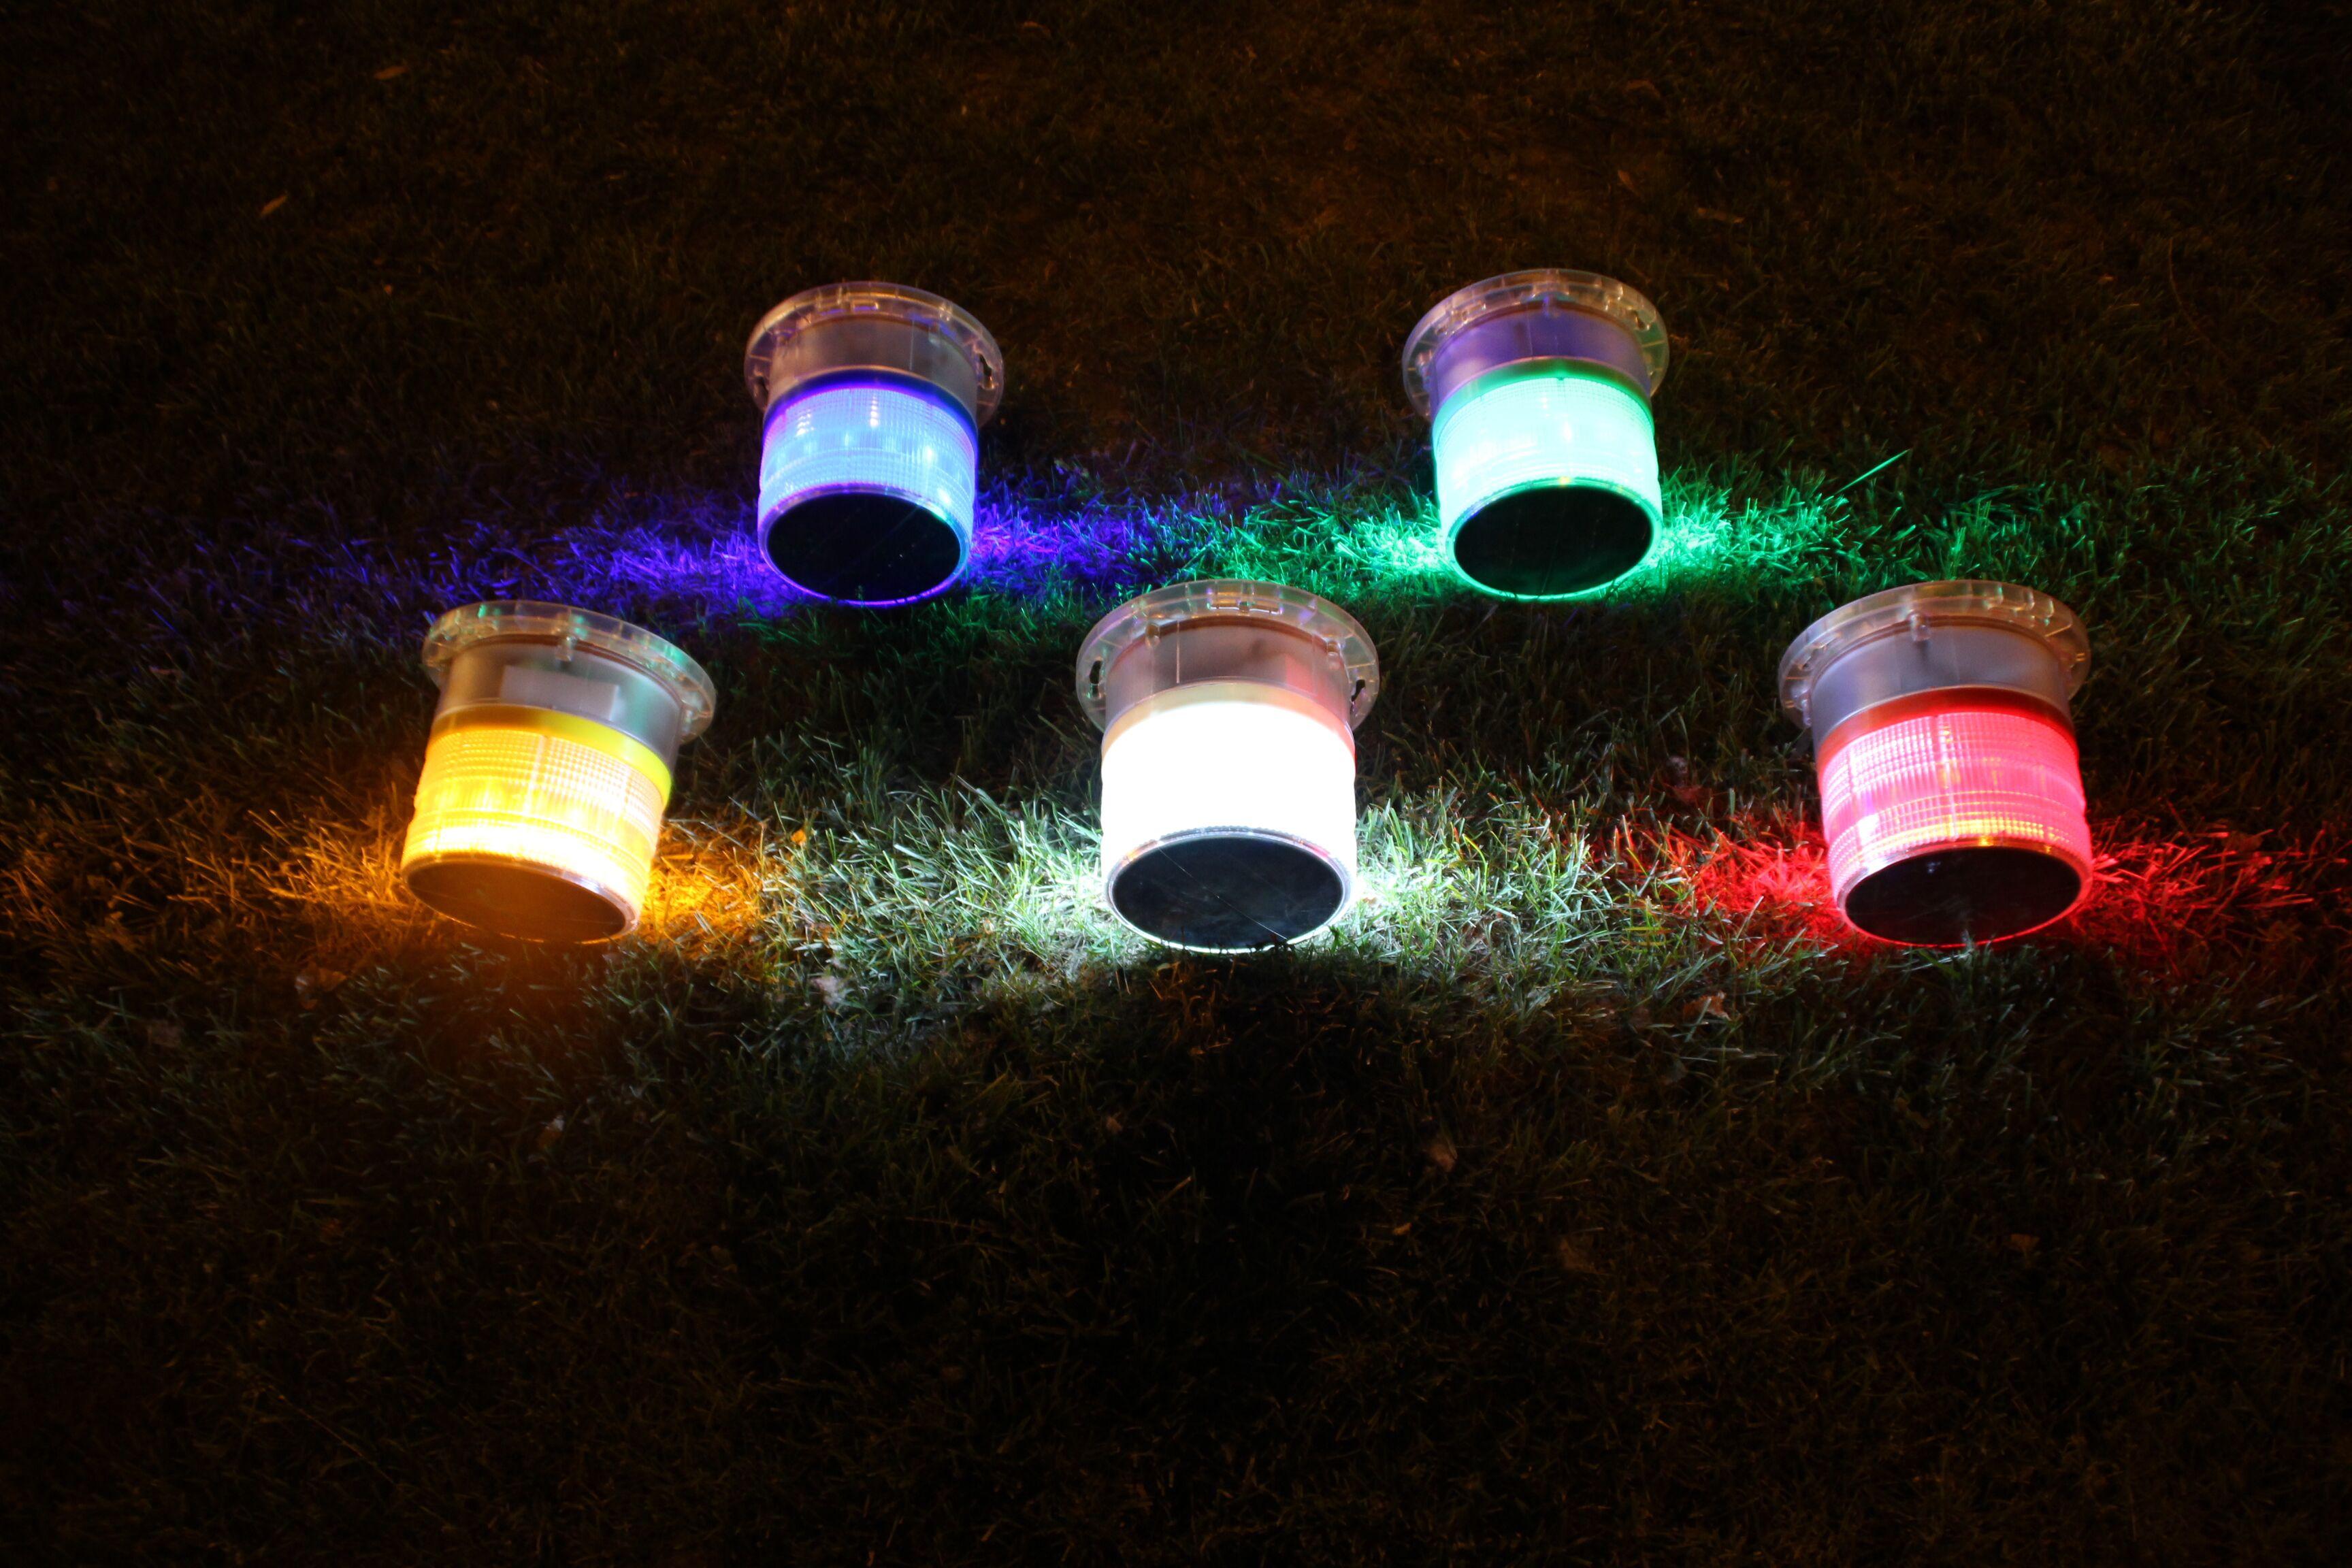 solar-power marine lantern / led navigation light